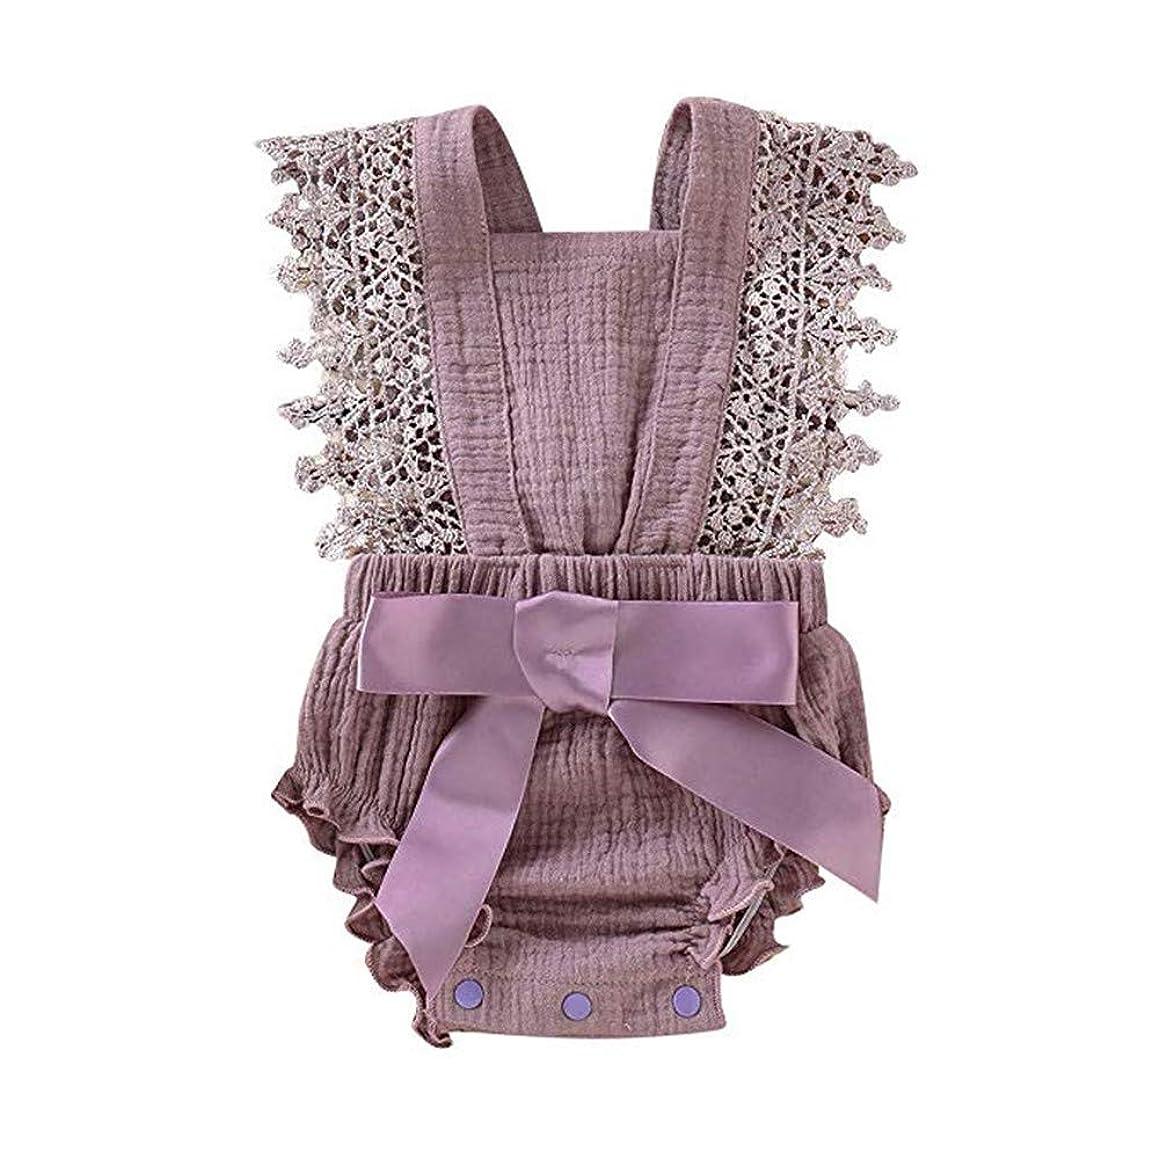 Newborn Baby Girl Ruffle Romper Lace Sleeveless Bodysuits Bowknot Jumpsuit Sunsuits